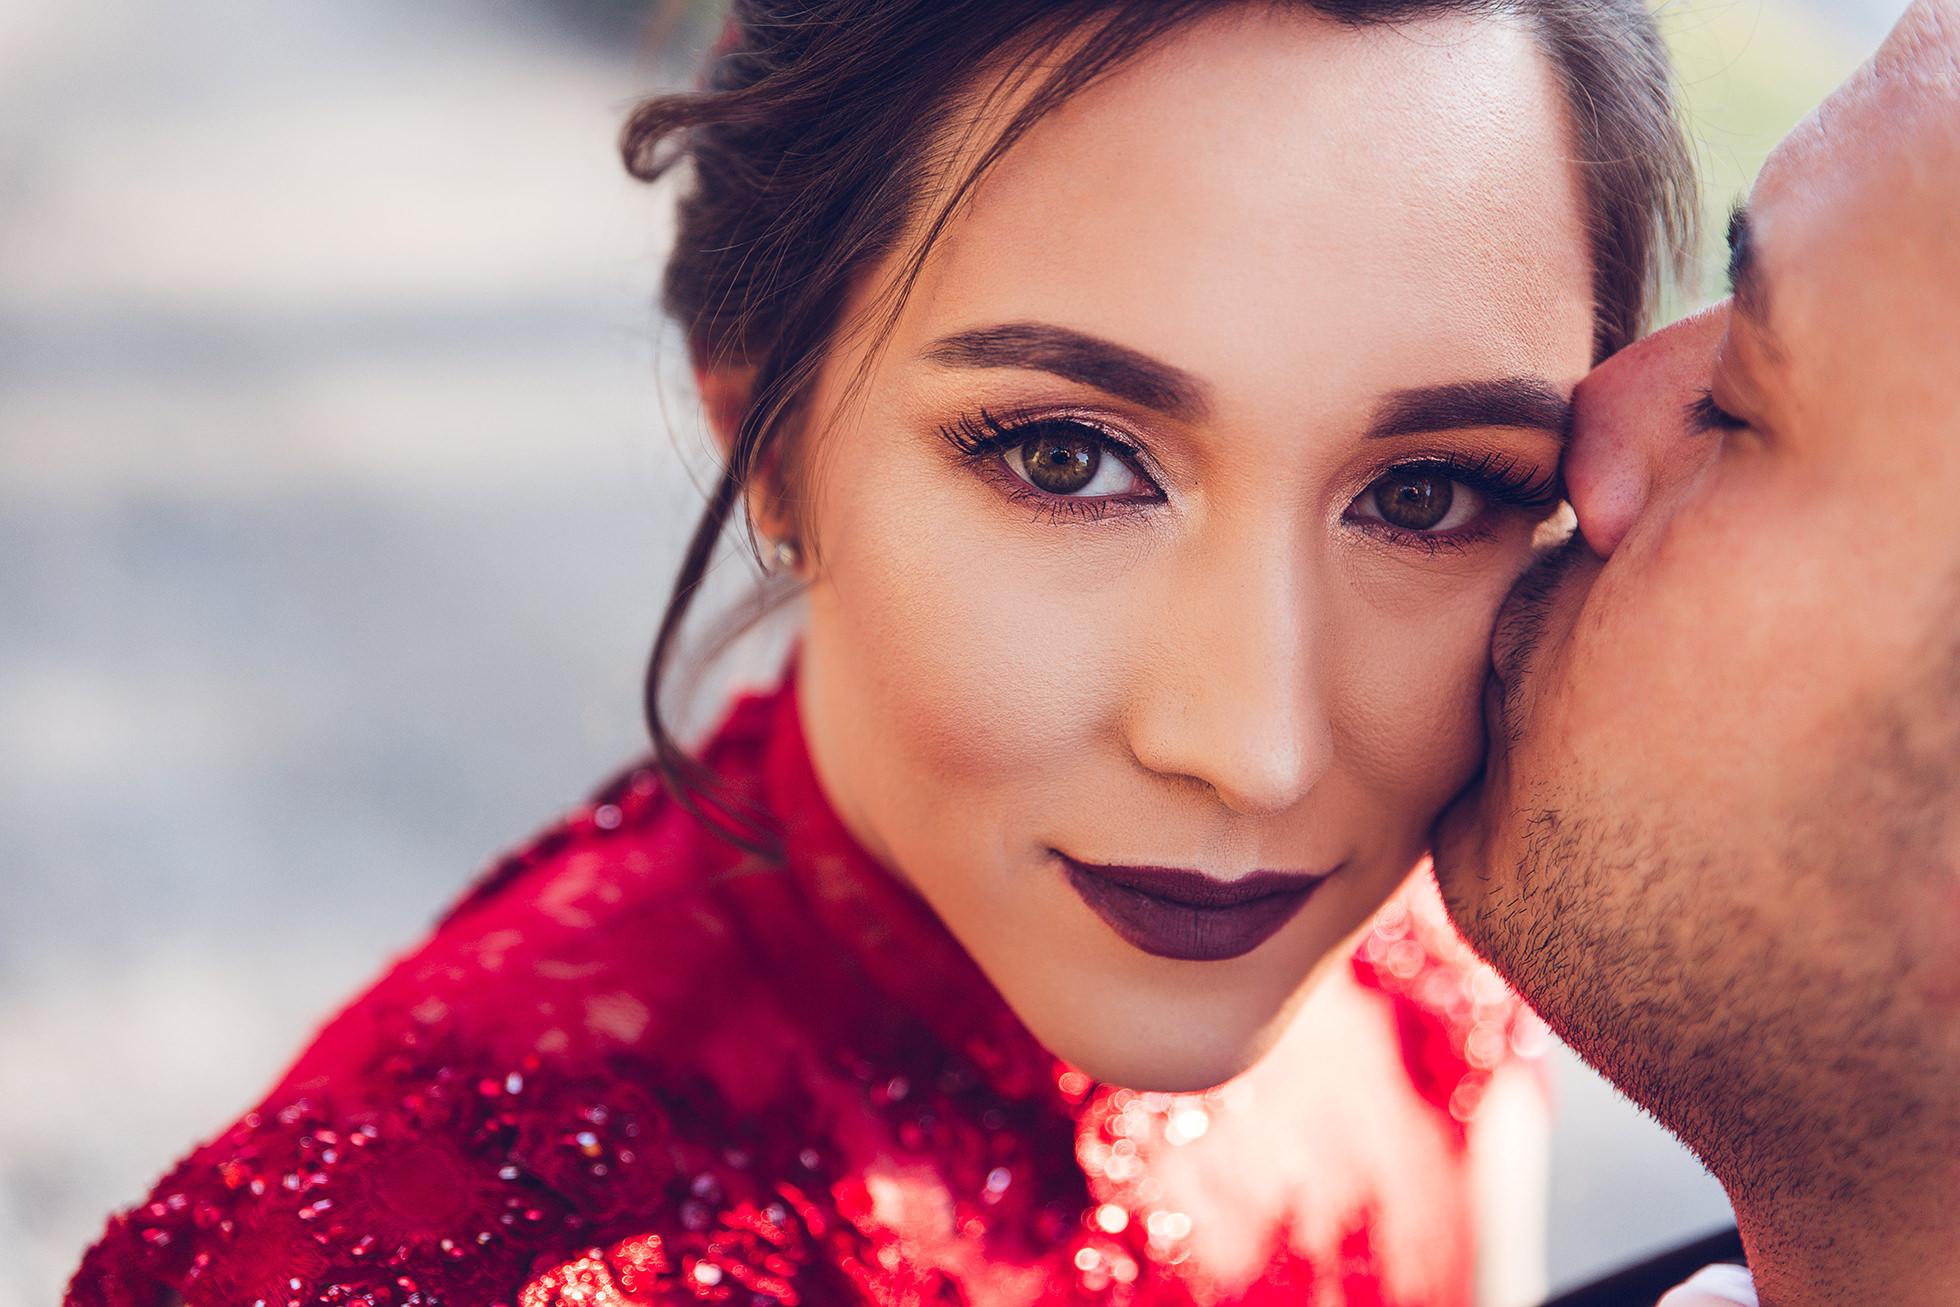 Verlobtes Paar im roten Kleid .jpg